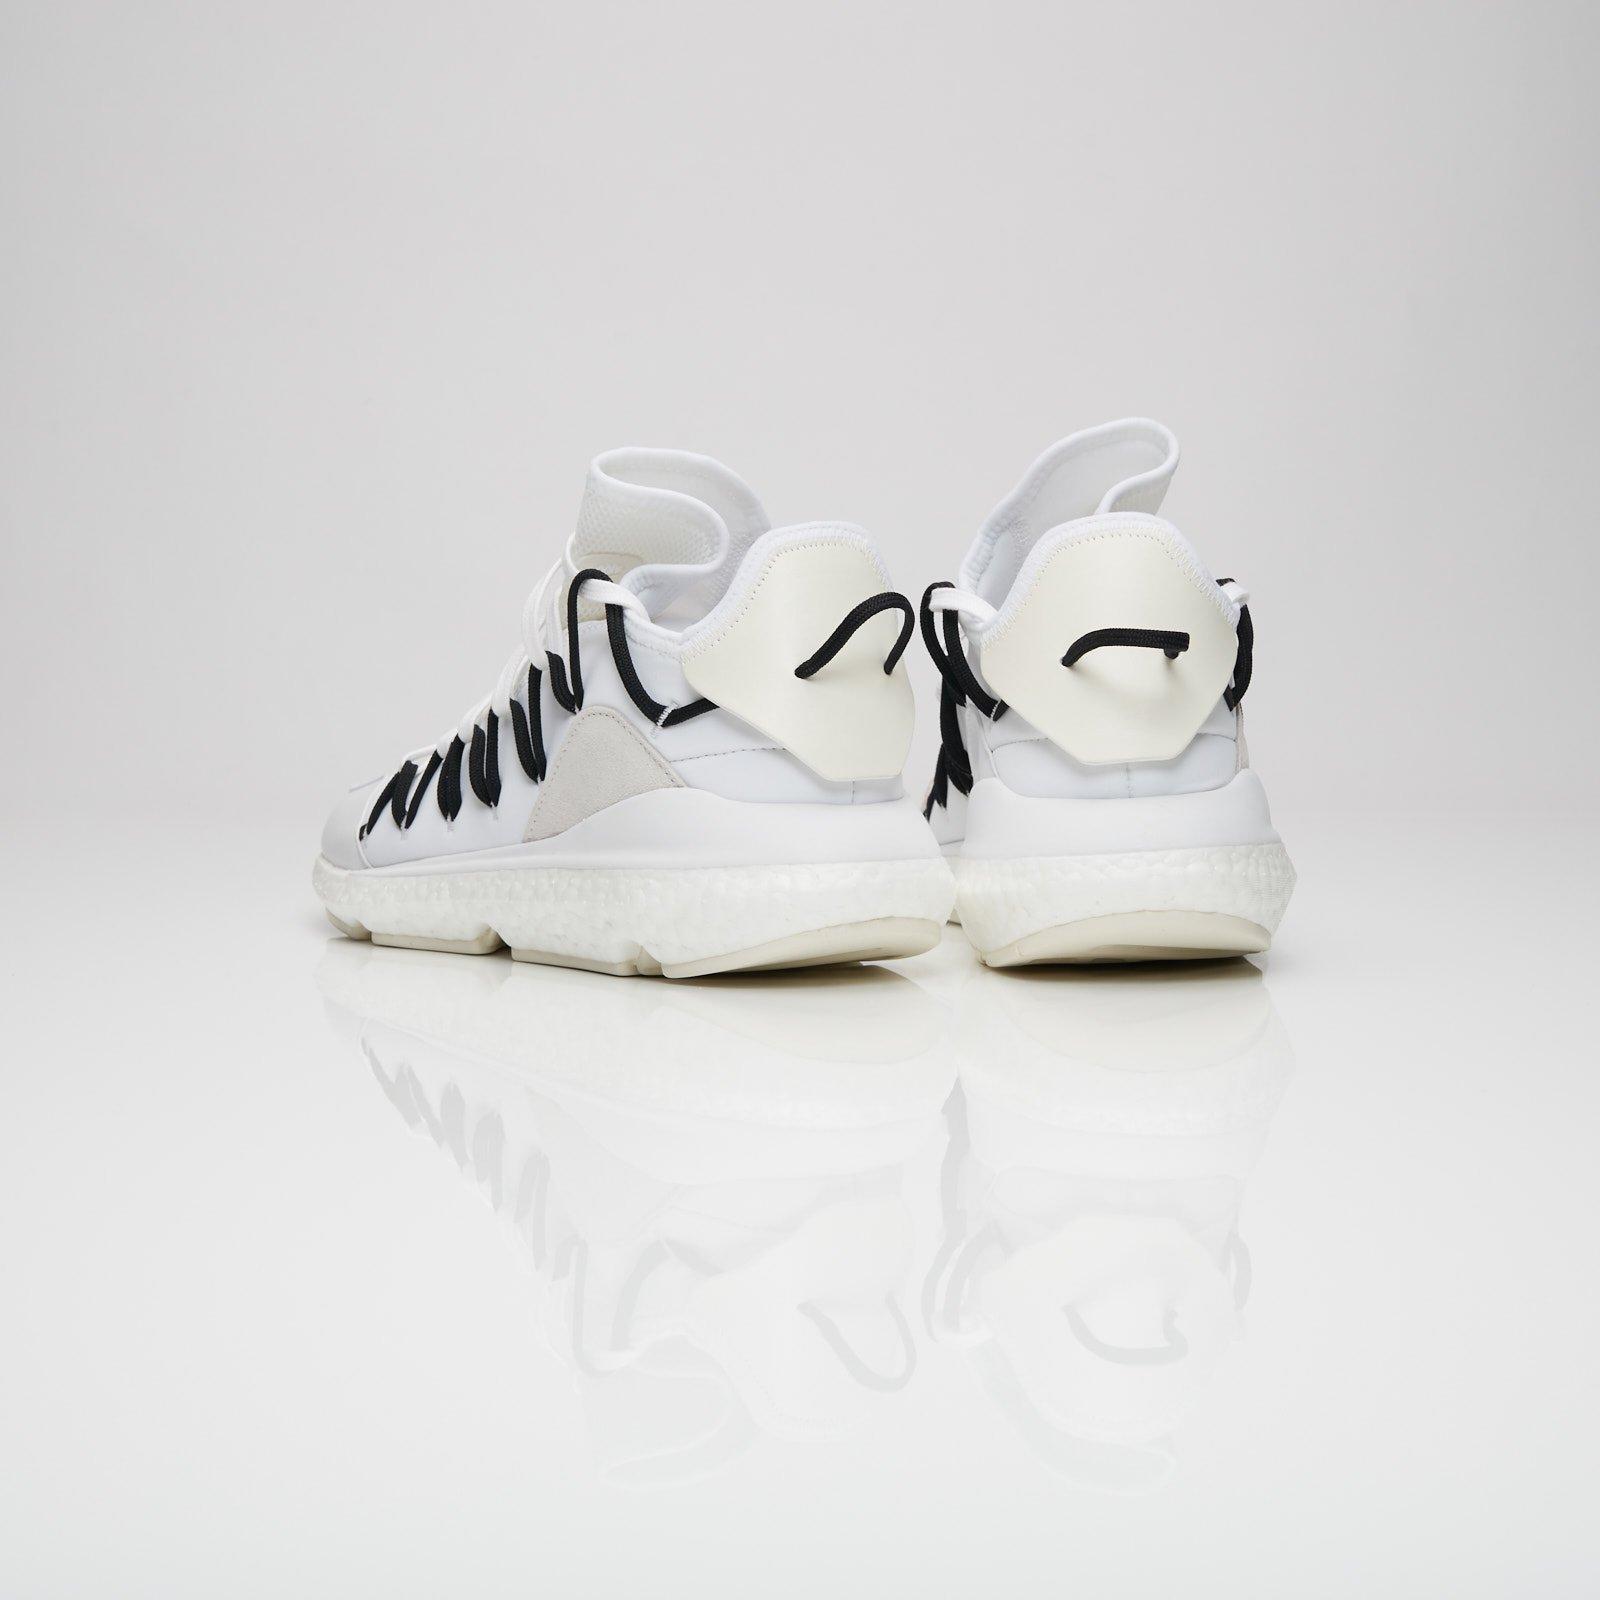 9b3b5cc62 adidas Y-3 Kusari - Bc0956 - Sneakersnstuff